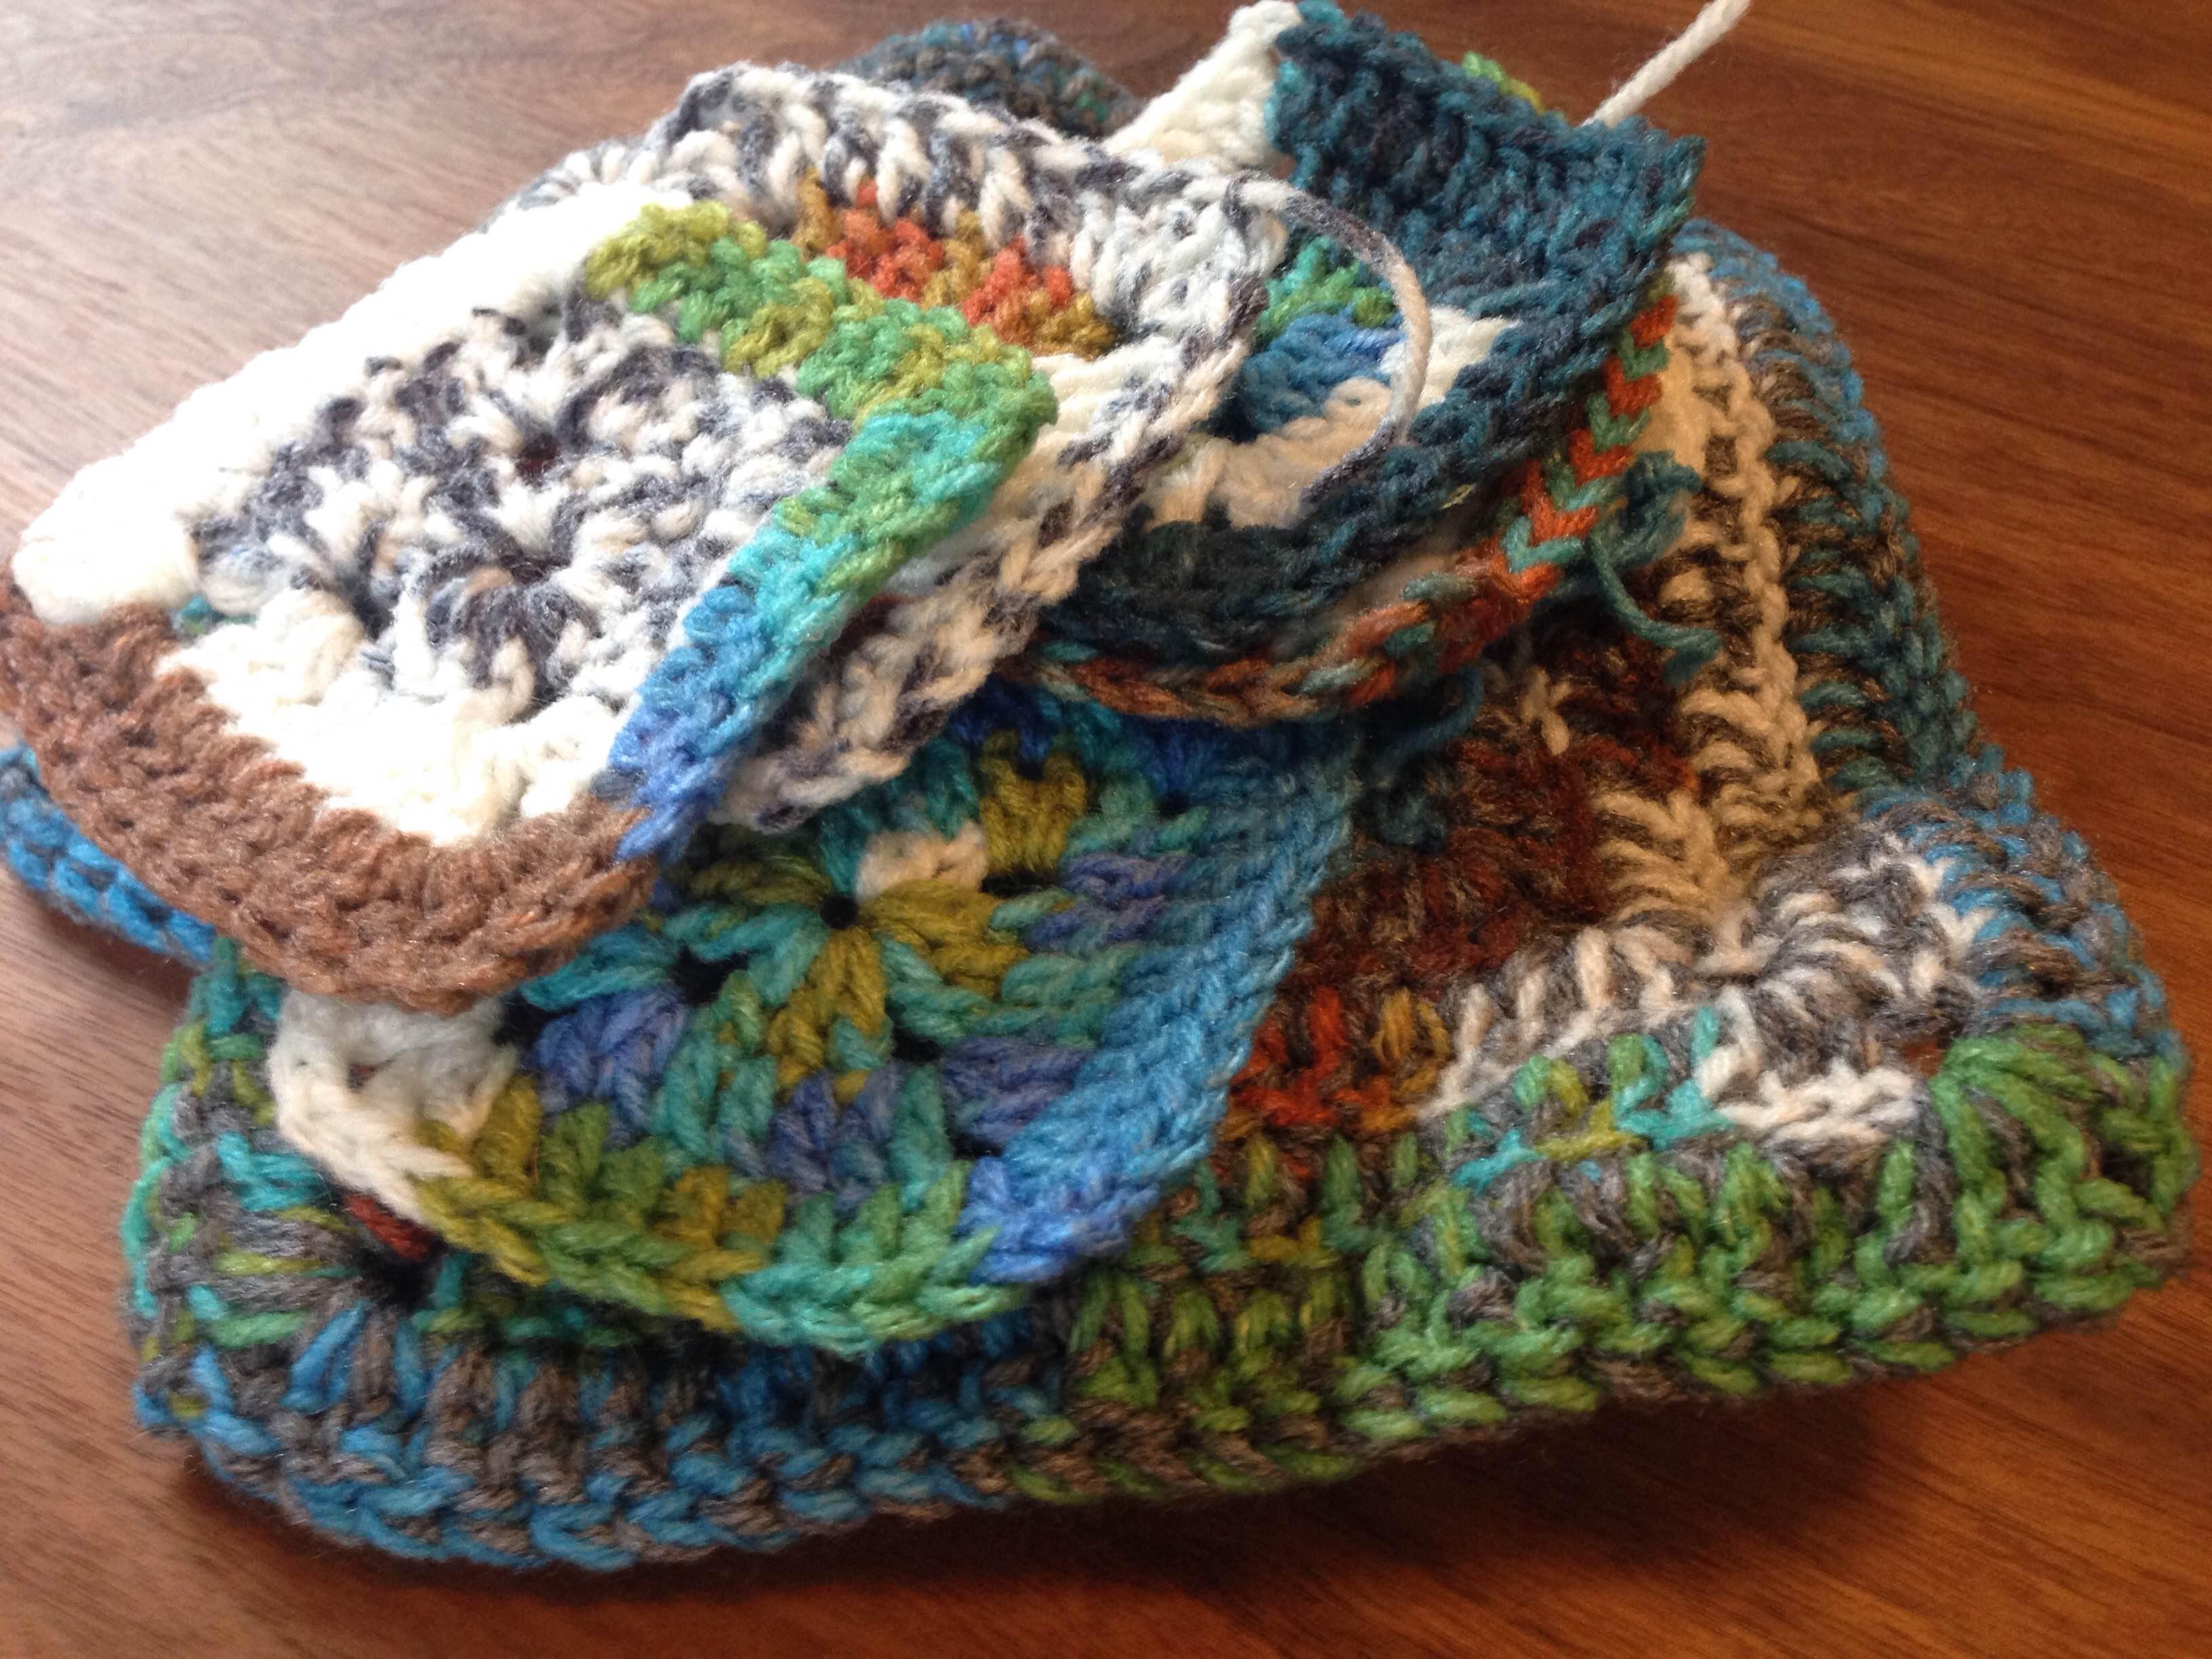 Crochet Pattern Yoga Pants : Swedish meatballs, yoga pants, and crocheted slippers ...